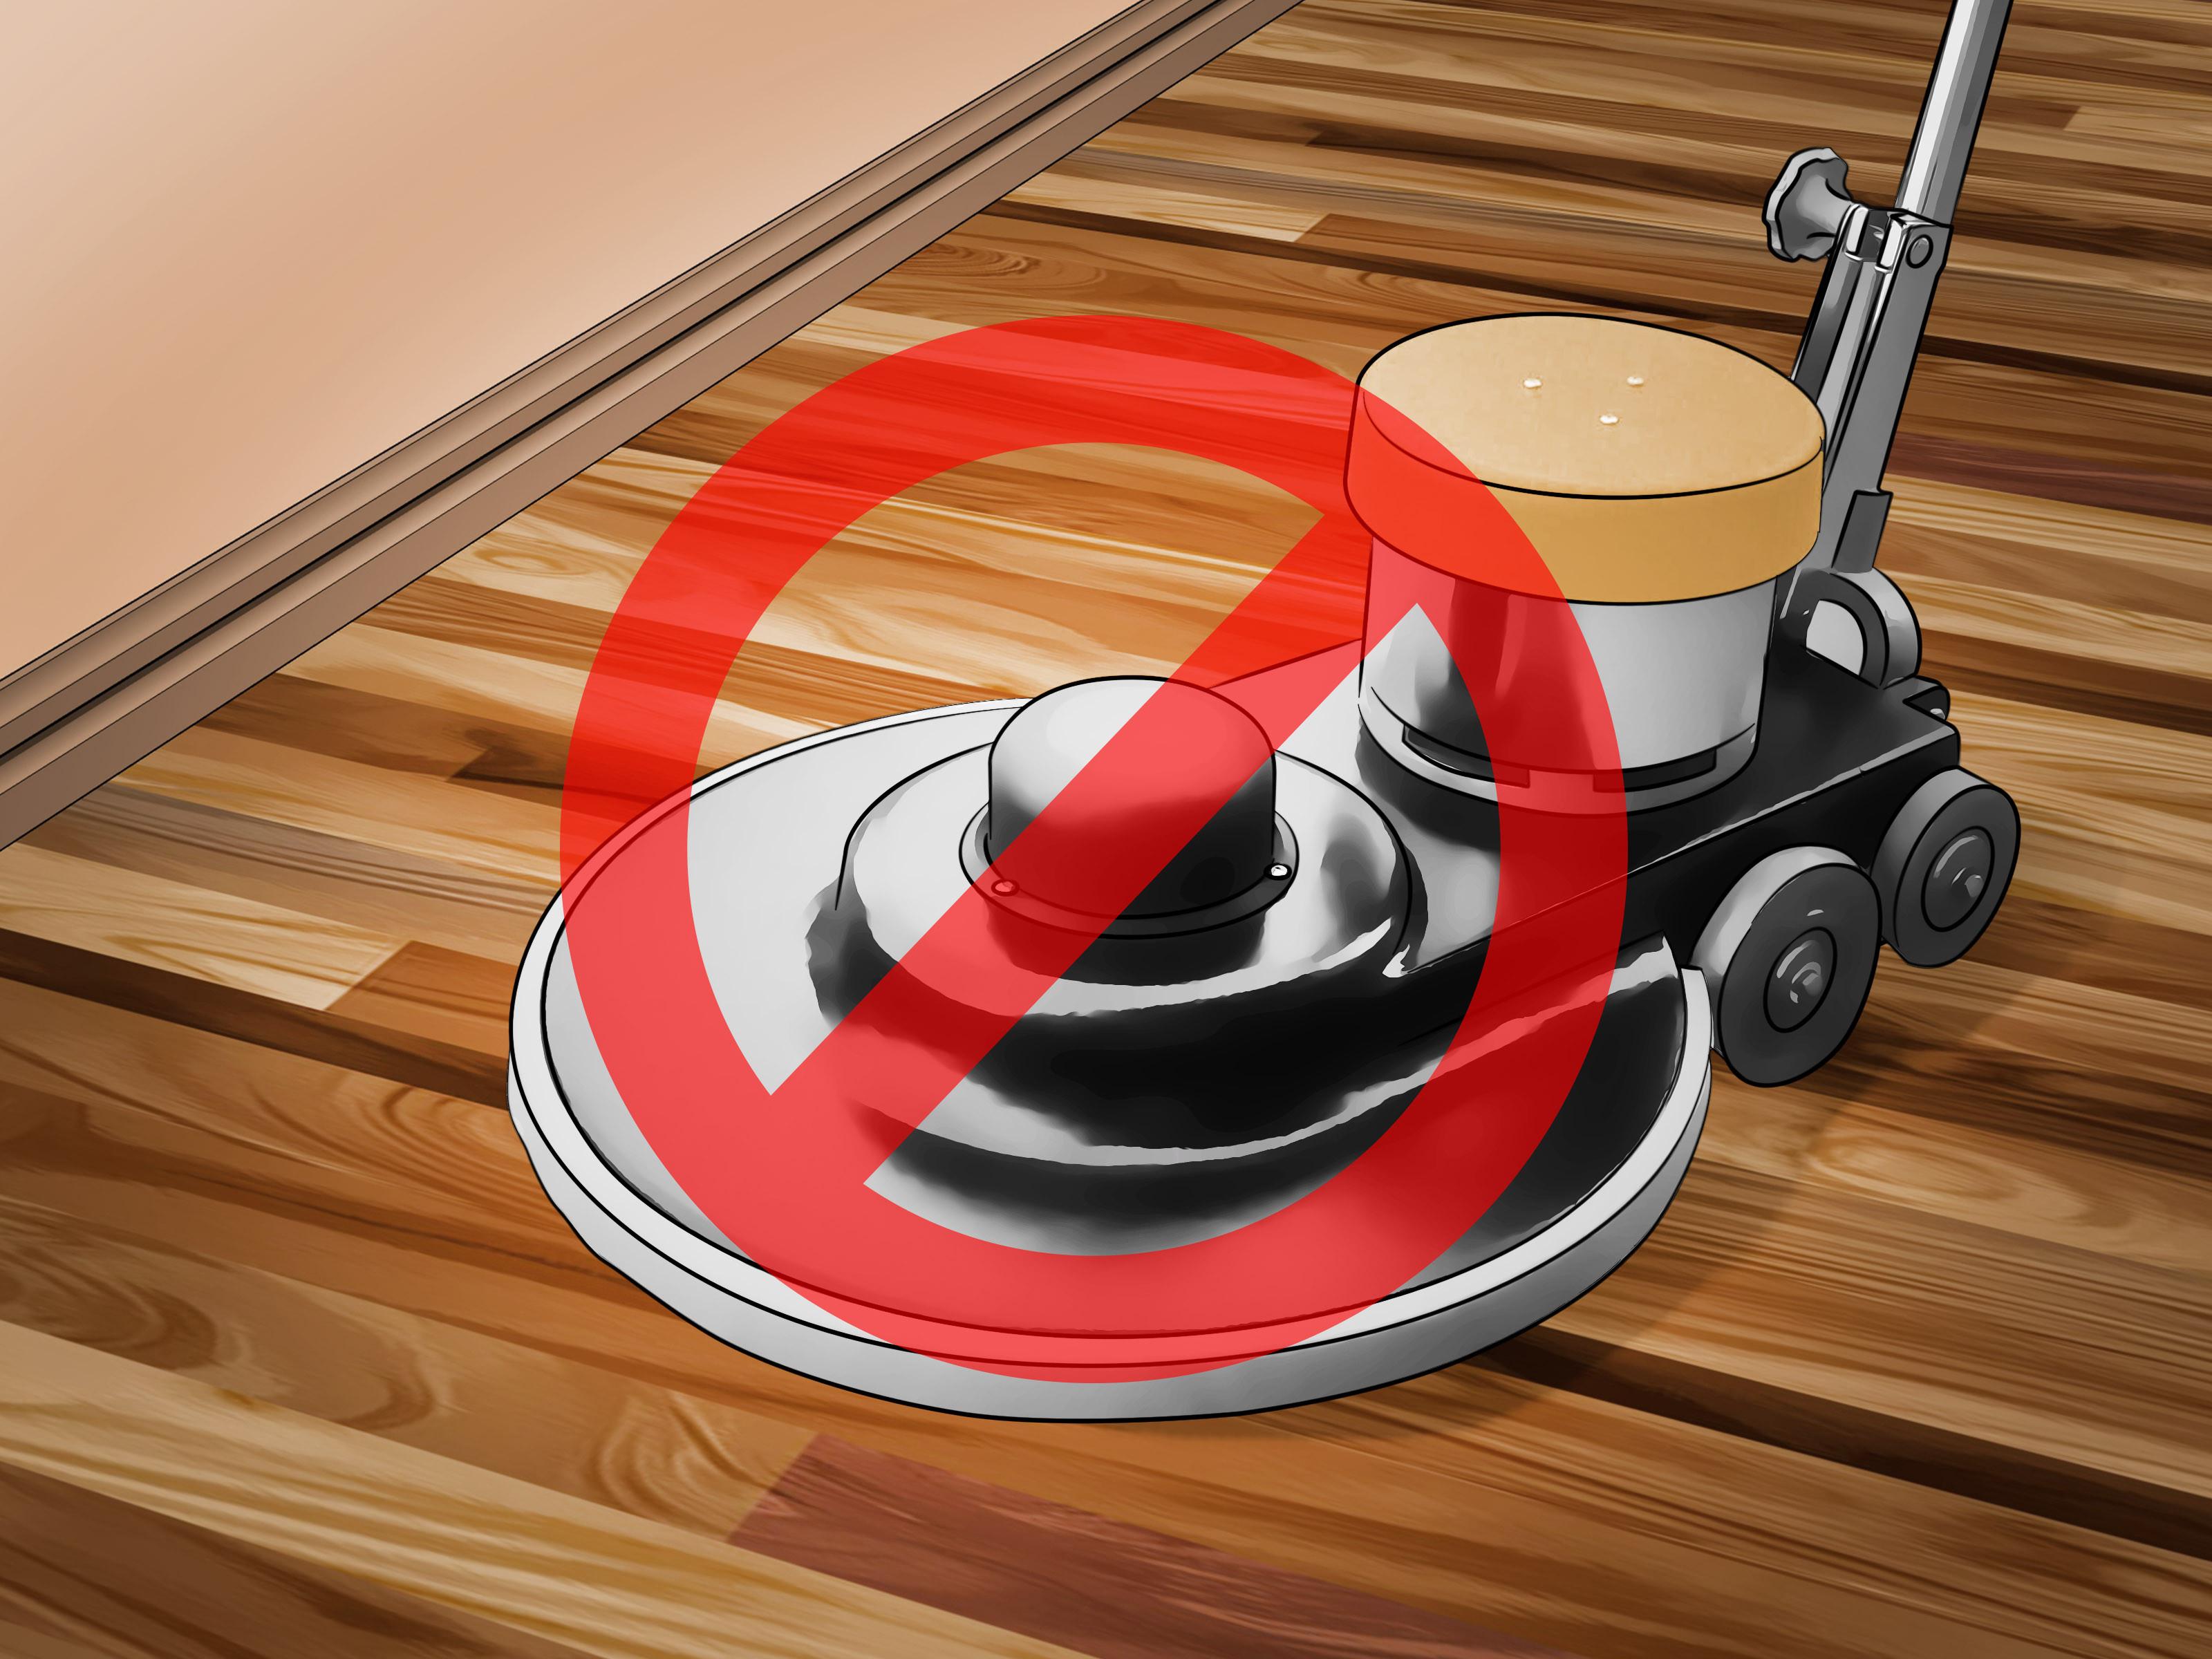 hardwood floor care vinegar of 4 ways to clean polyurethane wood floors wikihow throughout clean polyurethane wood floors step 15